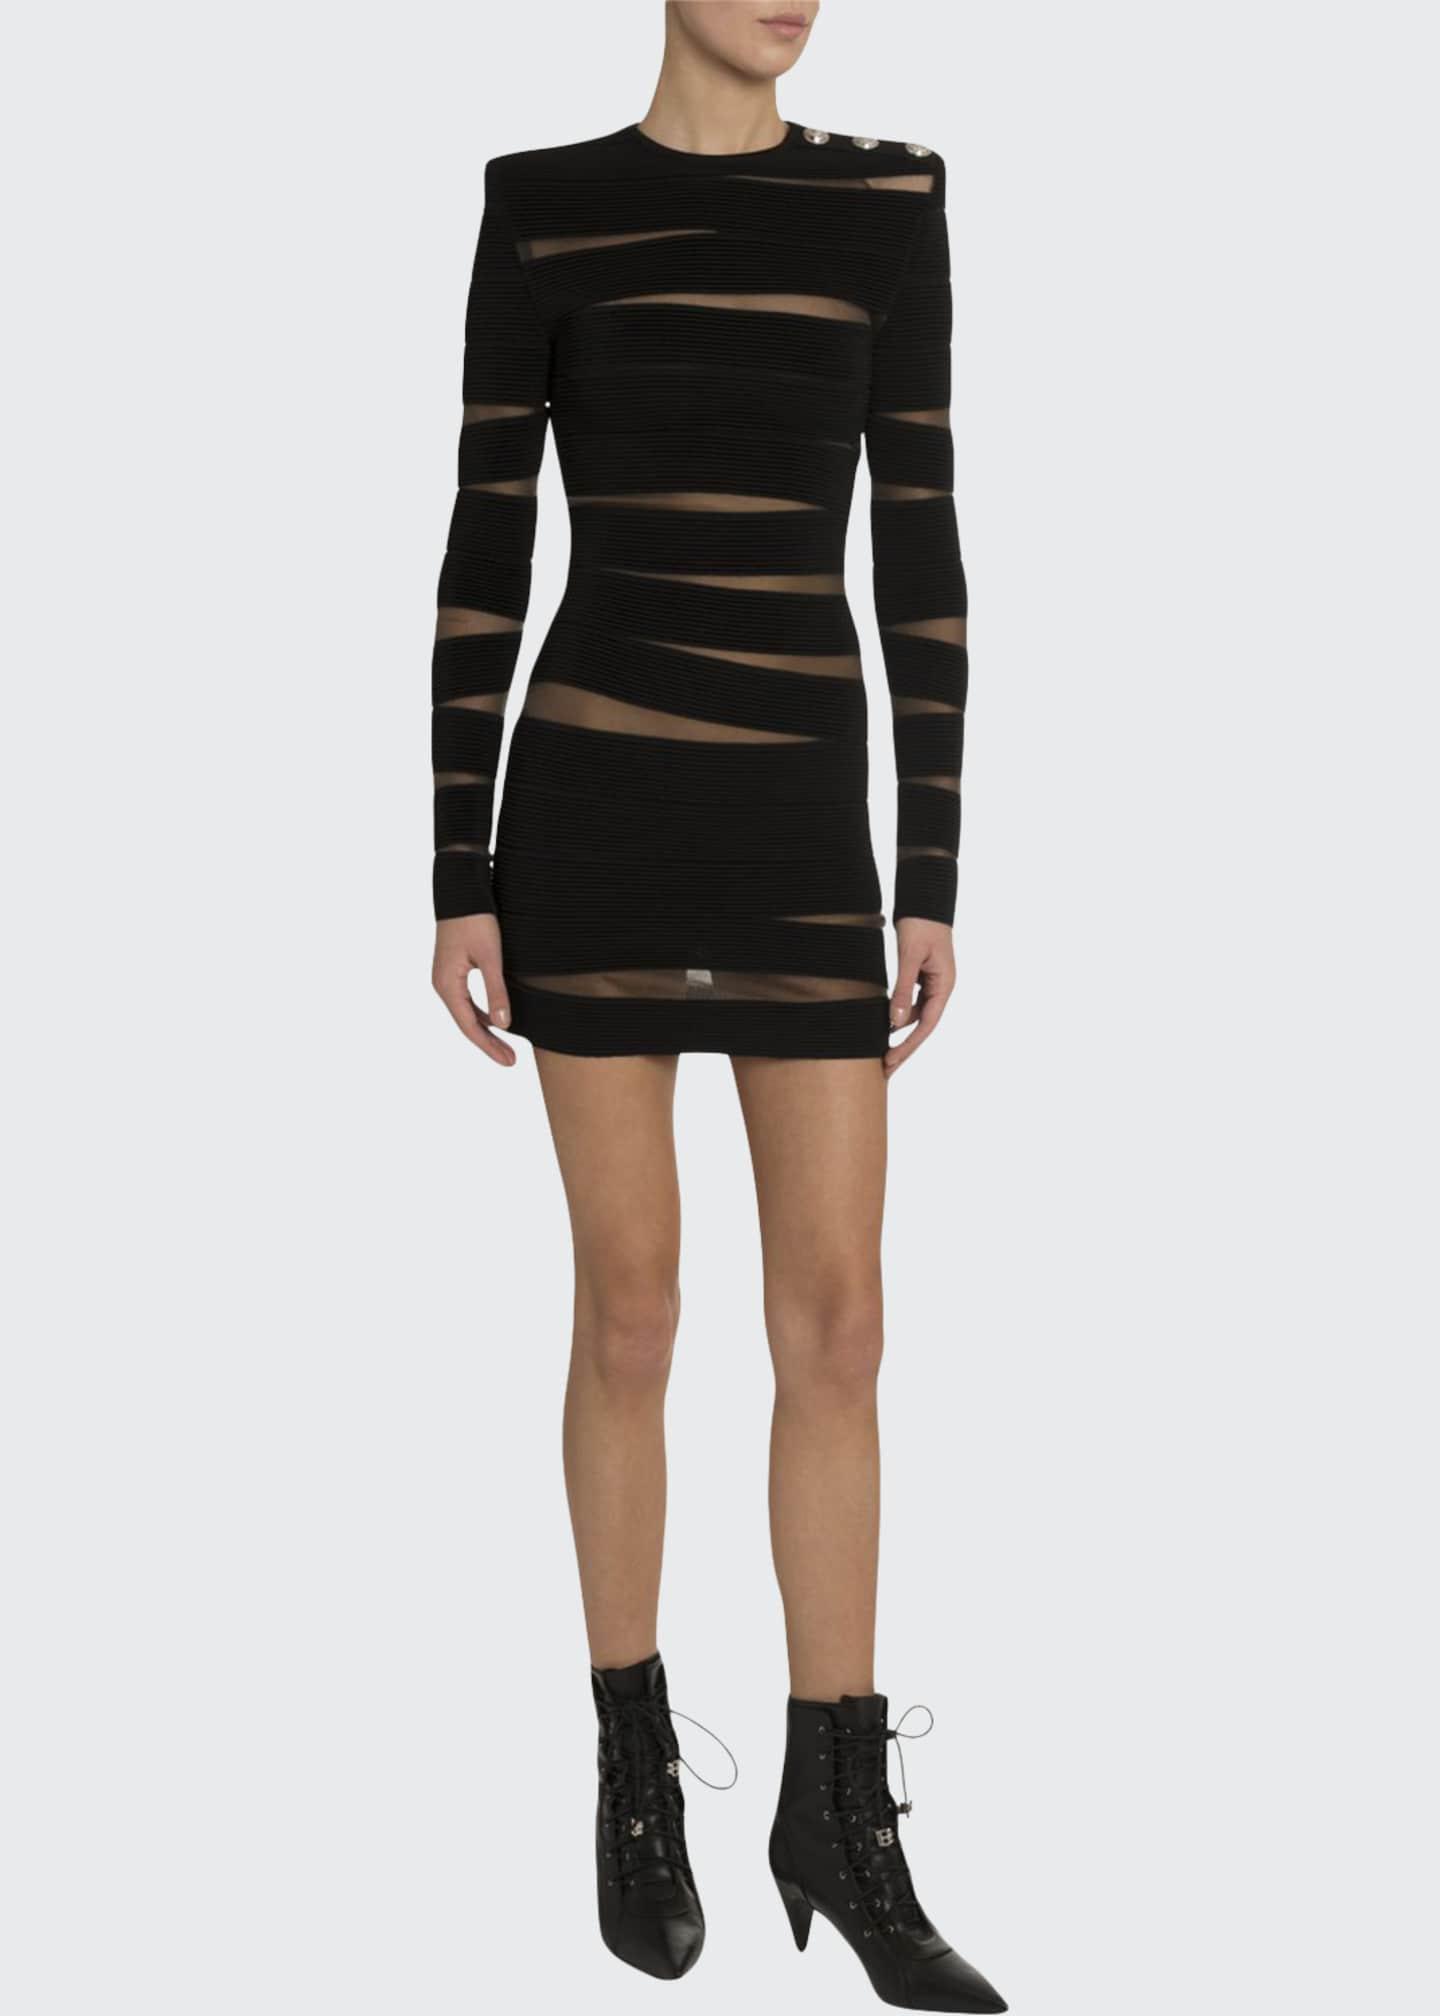 Balmain Long-Sleeve Paneled Sheer-Mesh Dress